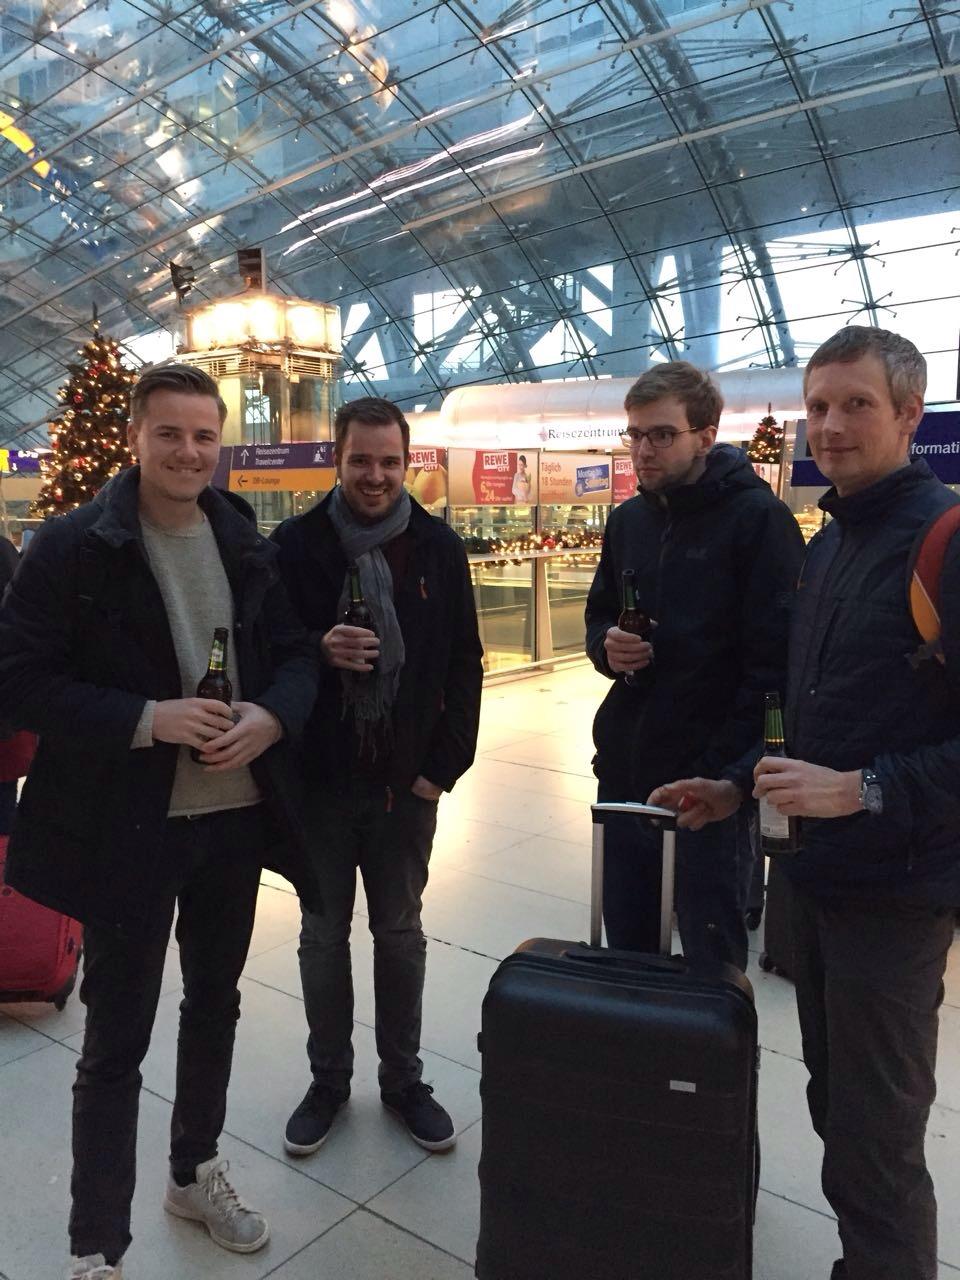 Frankfurt Flughafen - v.l. Fabian, Max, Mark und Bernd (Foto: Bernd Mensing)